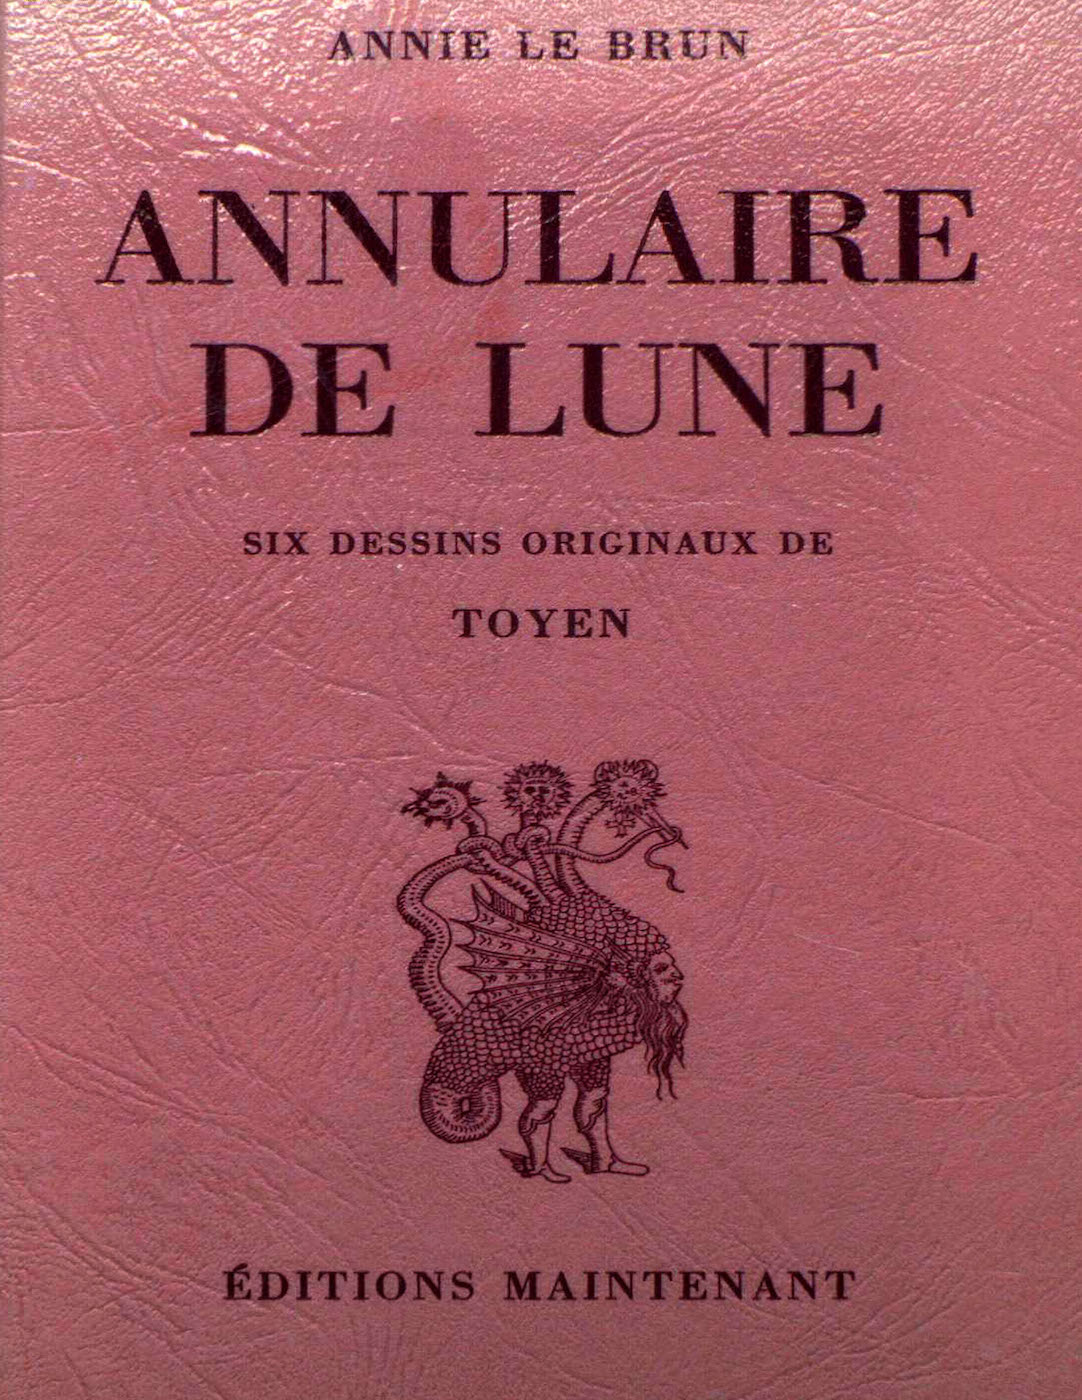 Annie Le Brun, <br /><em>Annulaire delune</em>, 1977